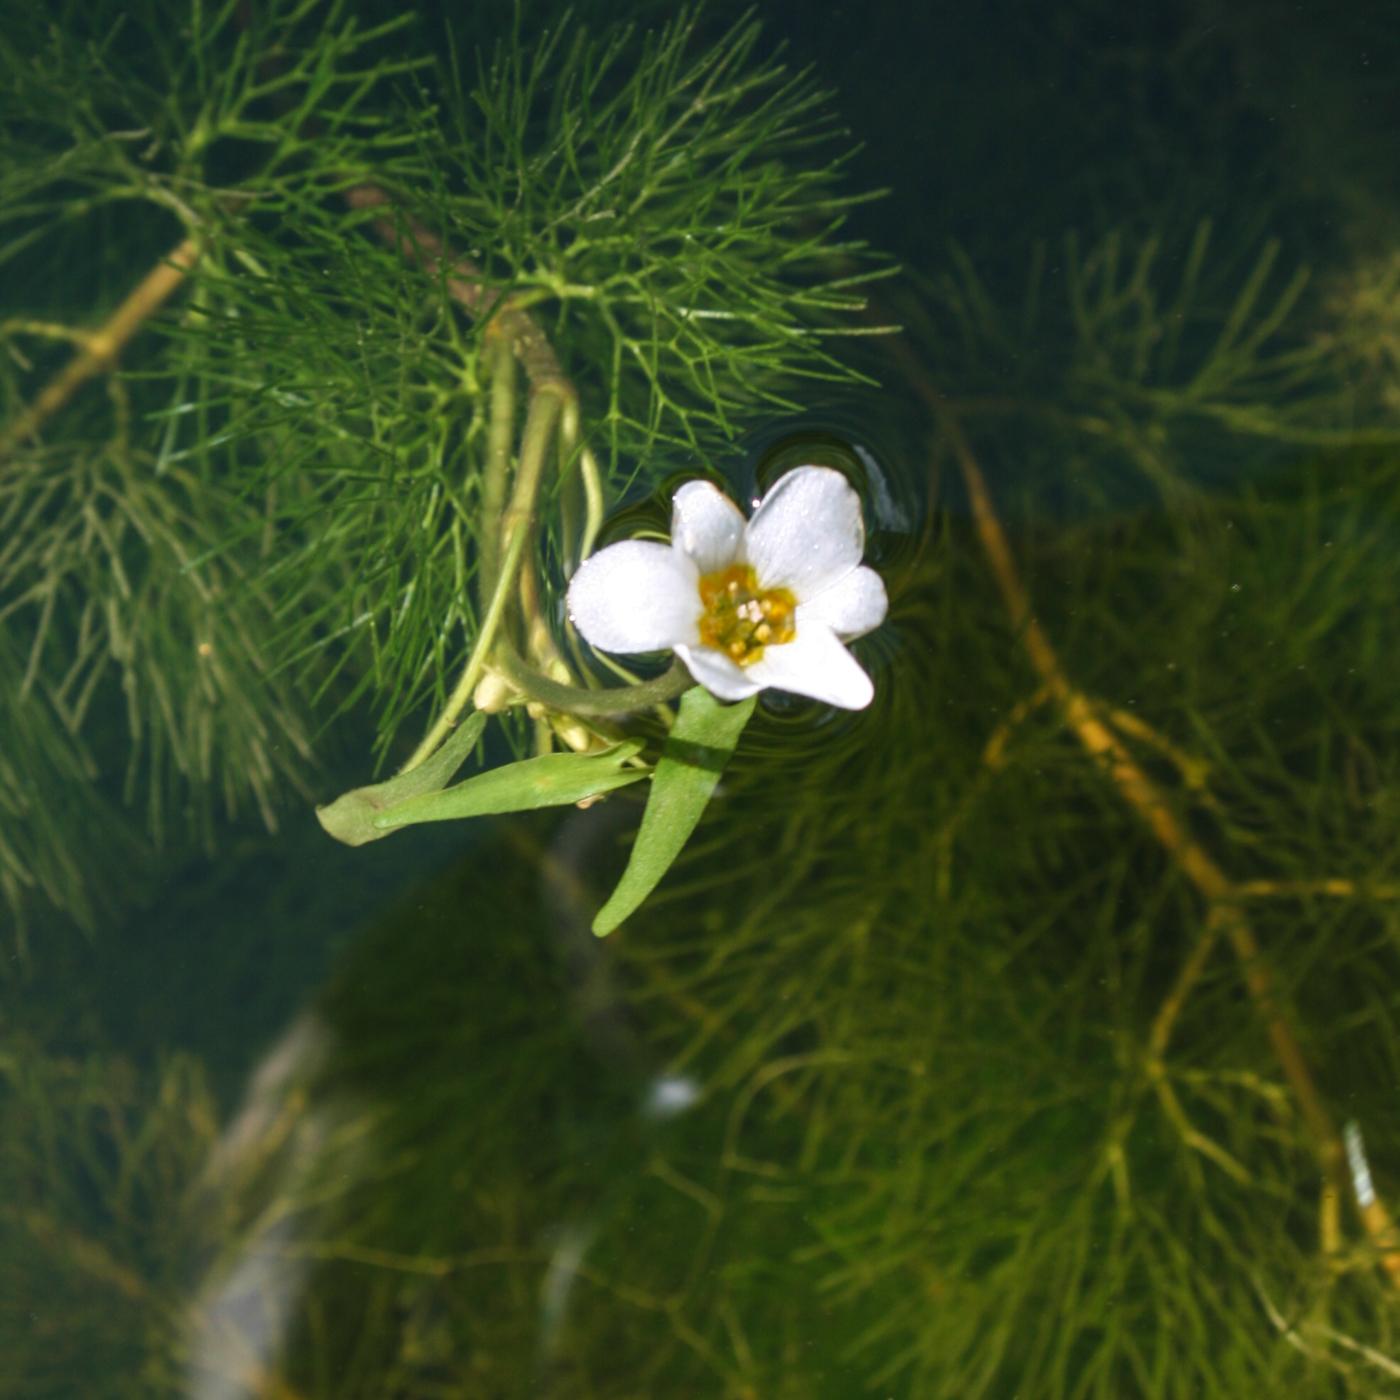 Cabomba caroliniana flower 1 (1 of 1).jpg